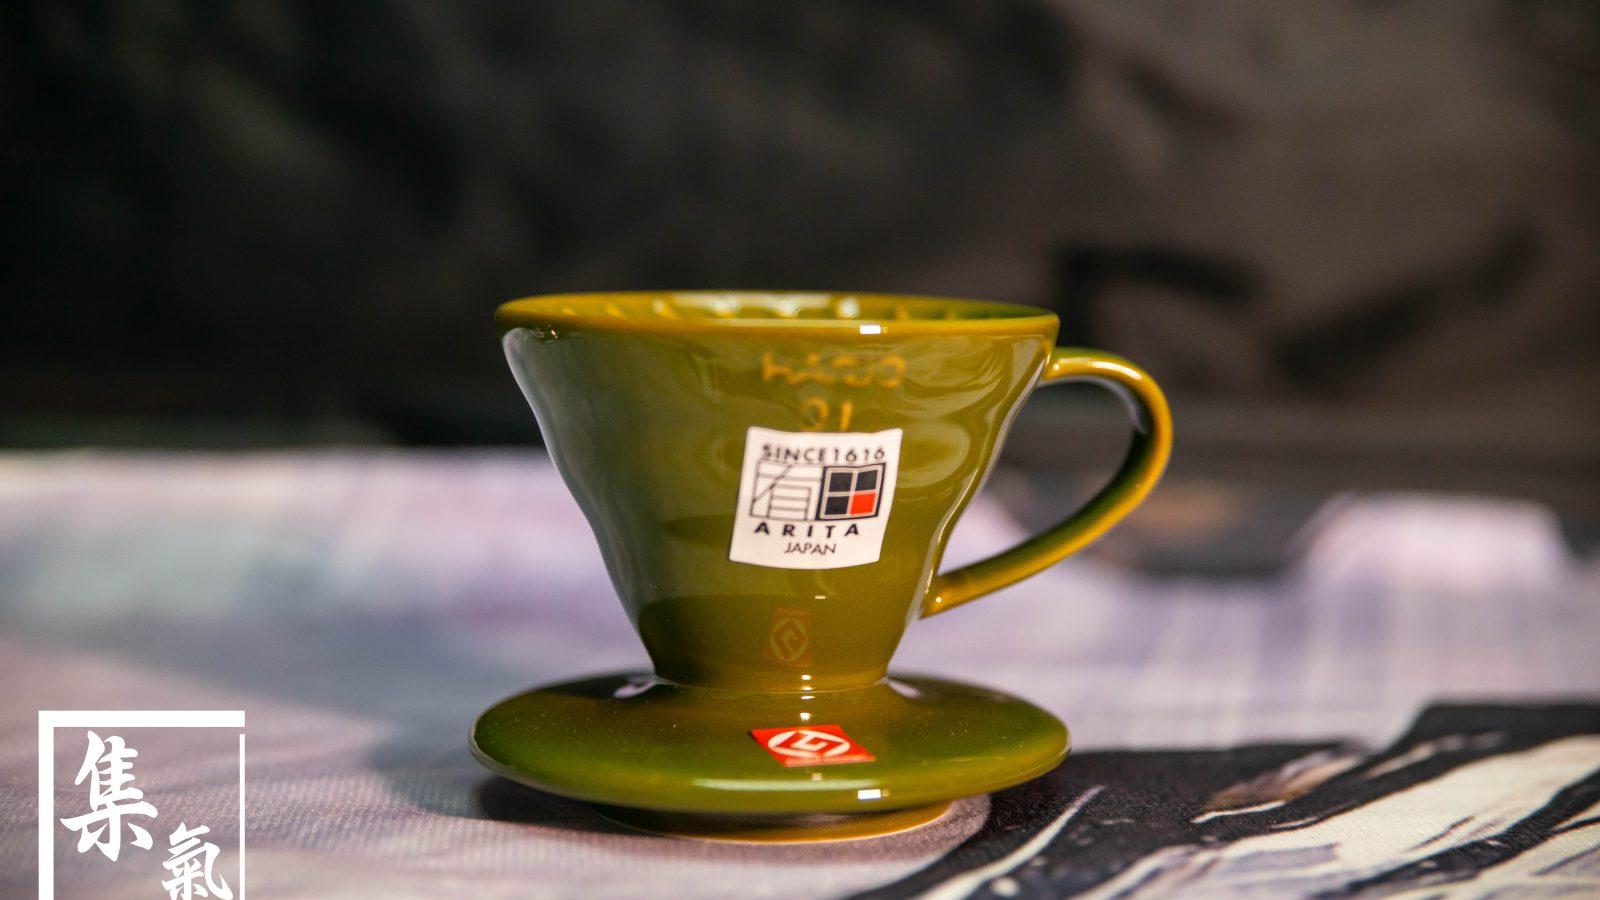 Hario V60 01藍媚茶手沖套裝